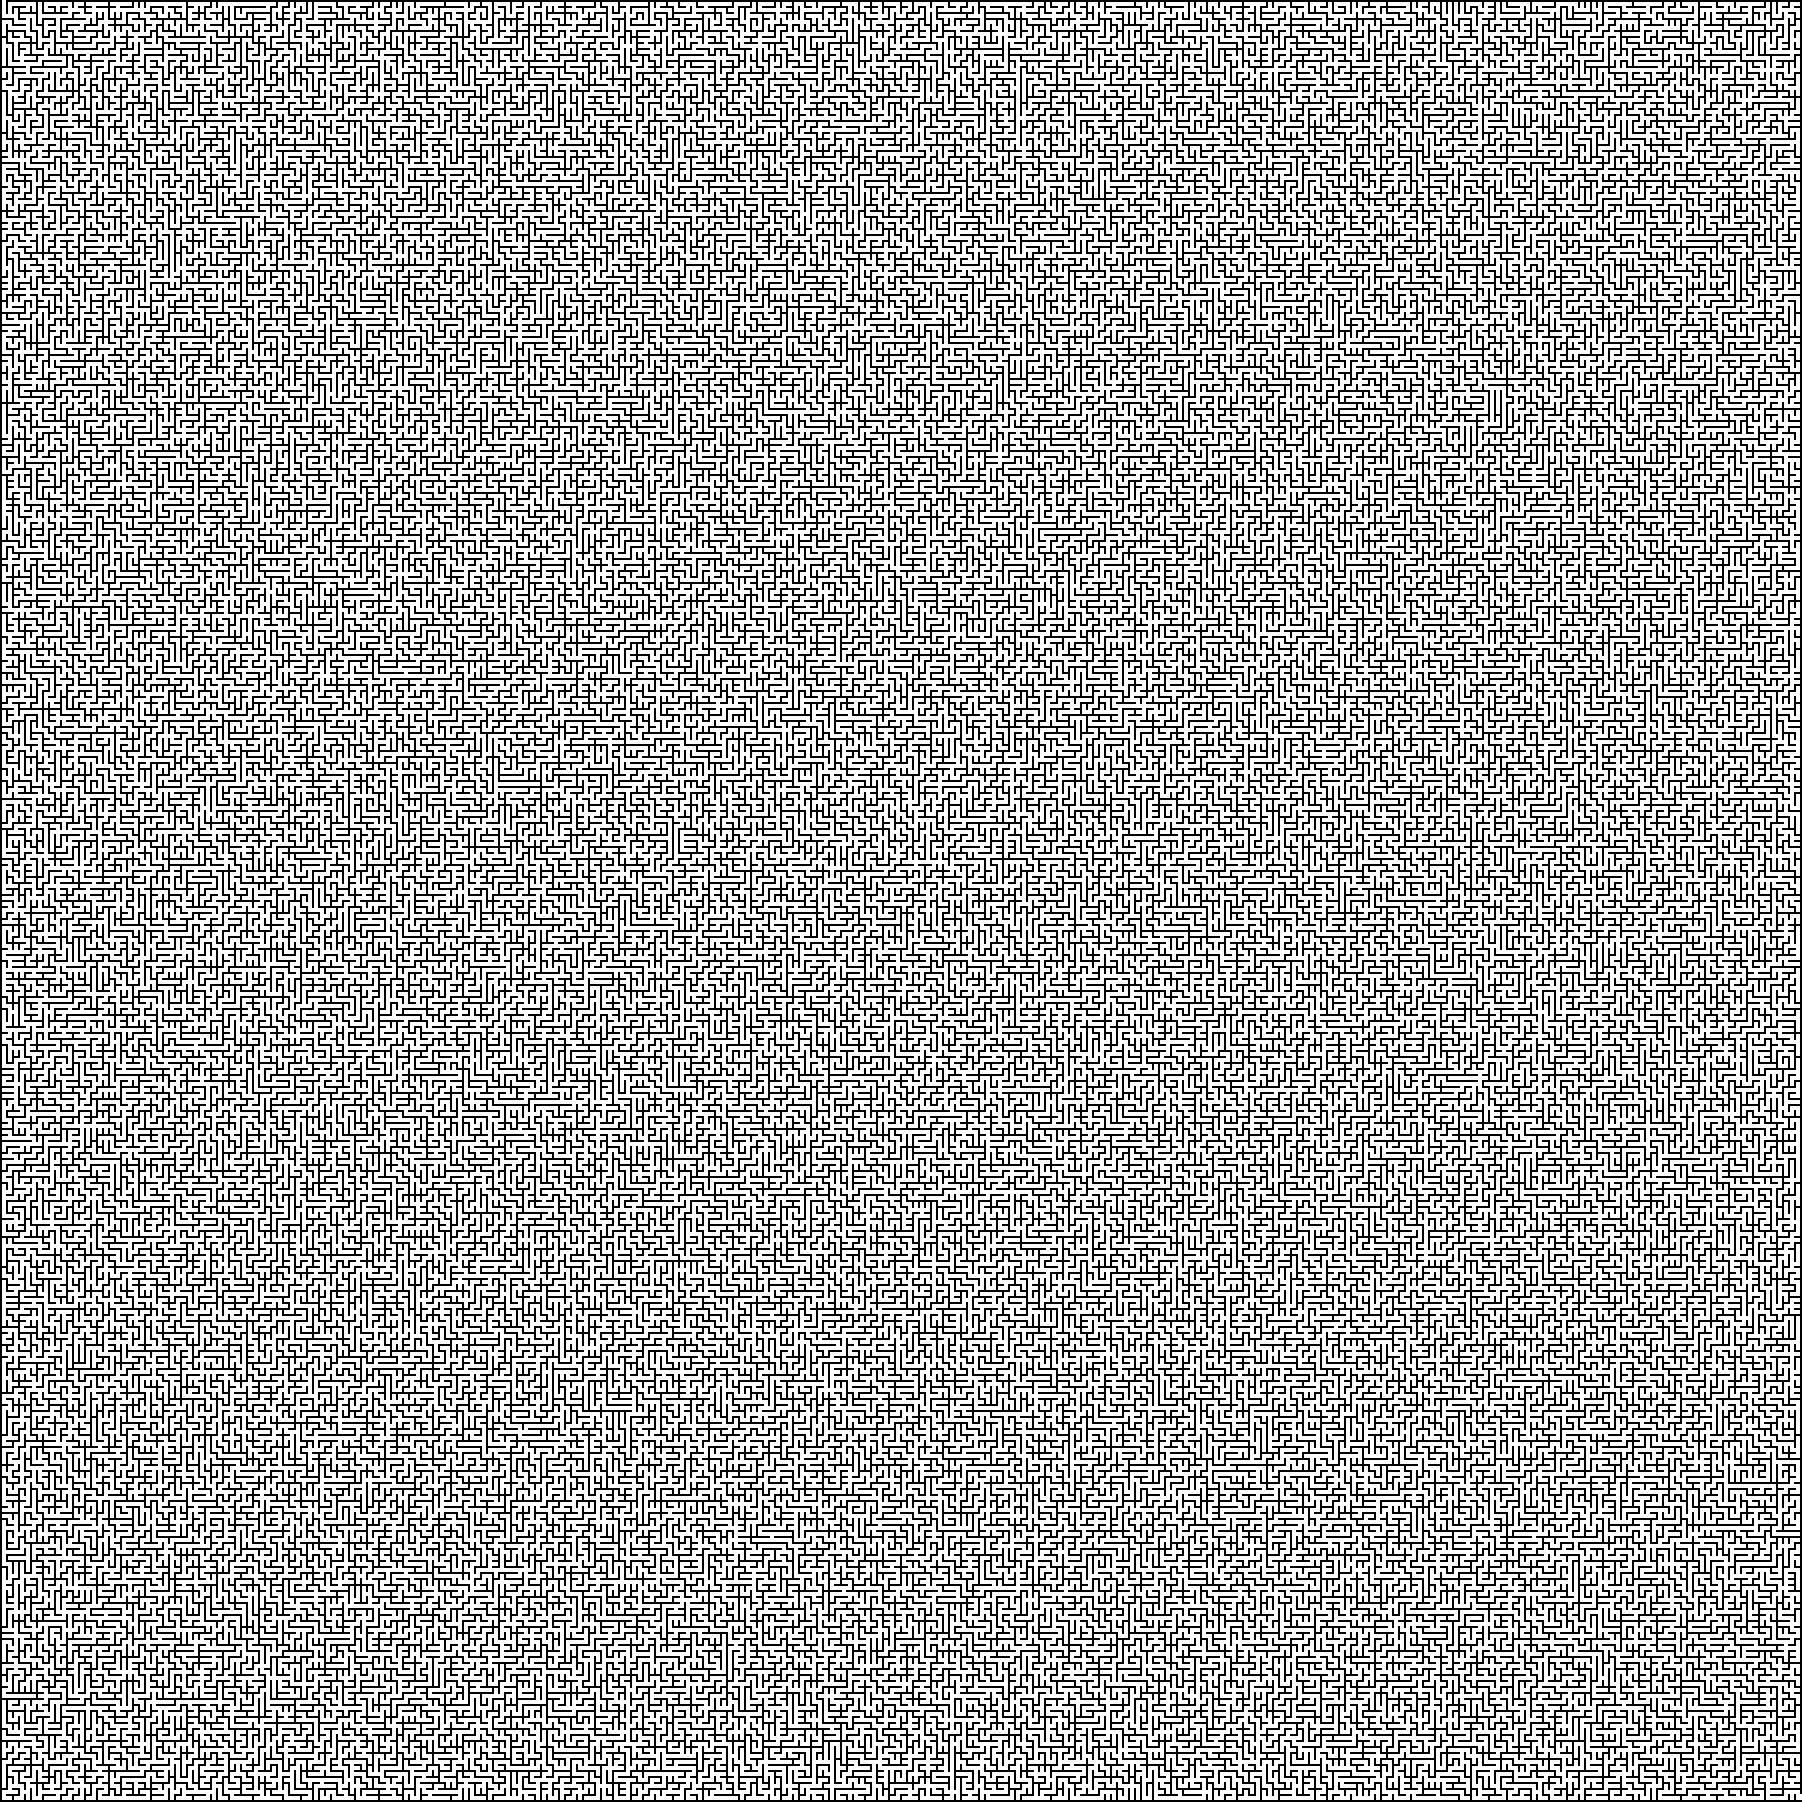 Mazes An A Maze Ing Subreddit